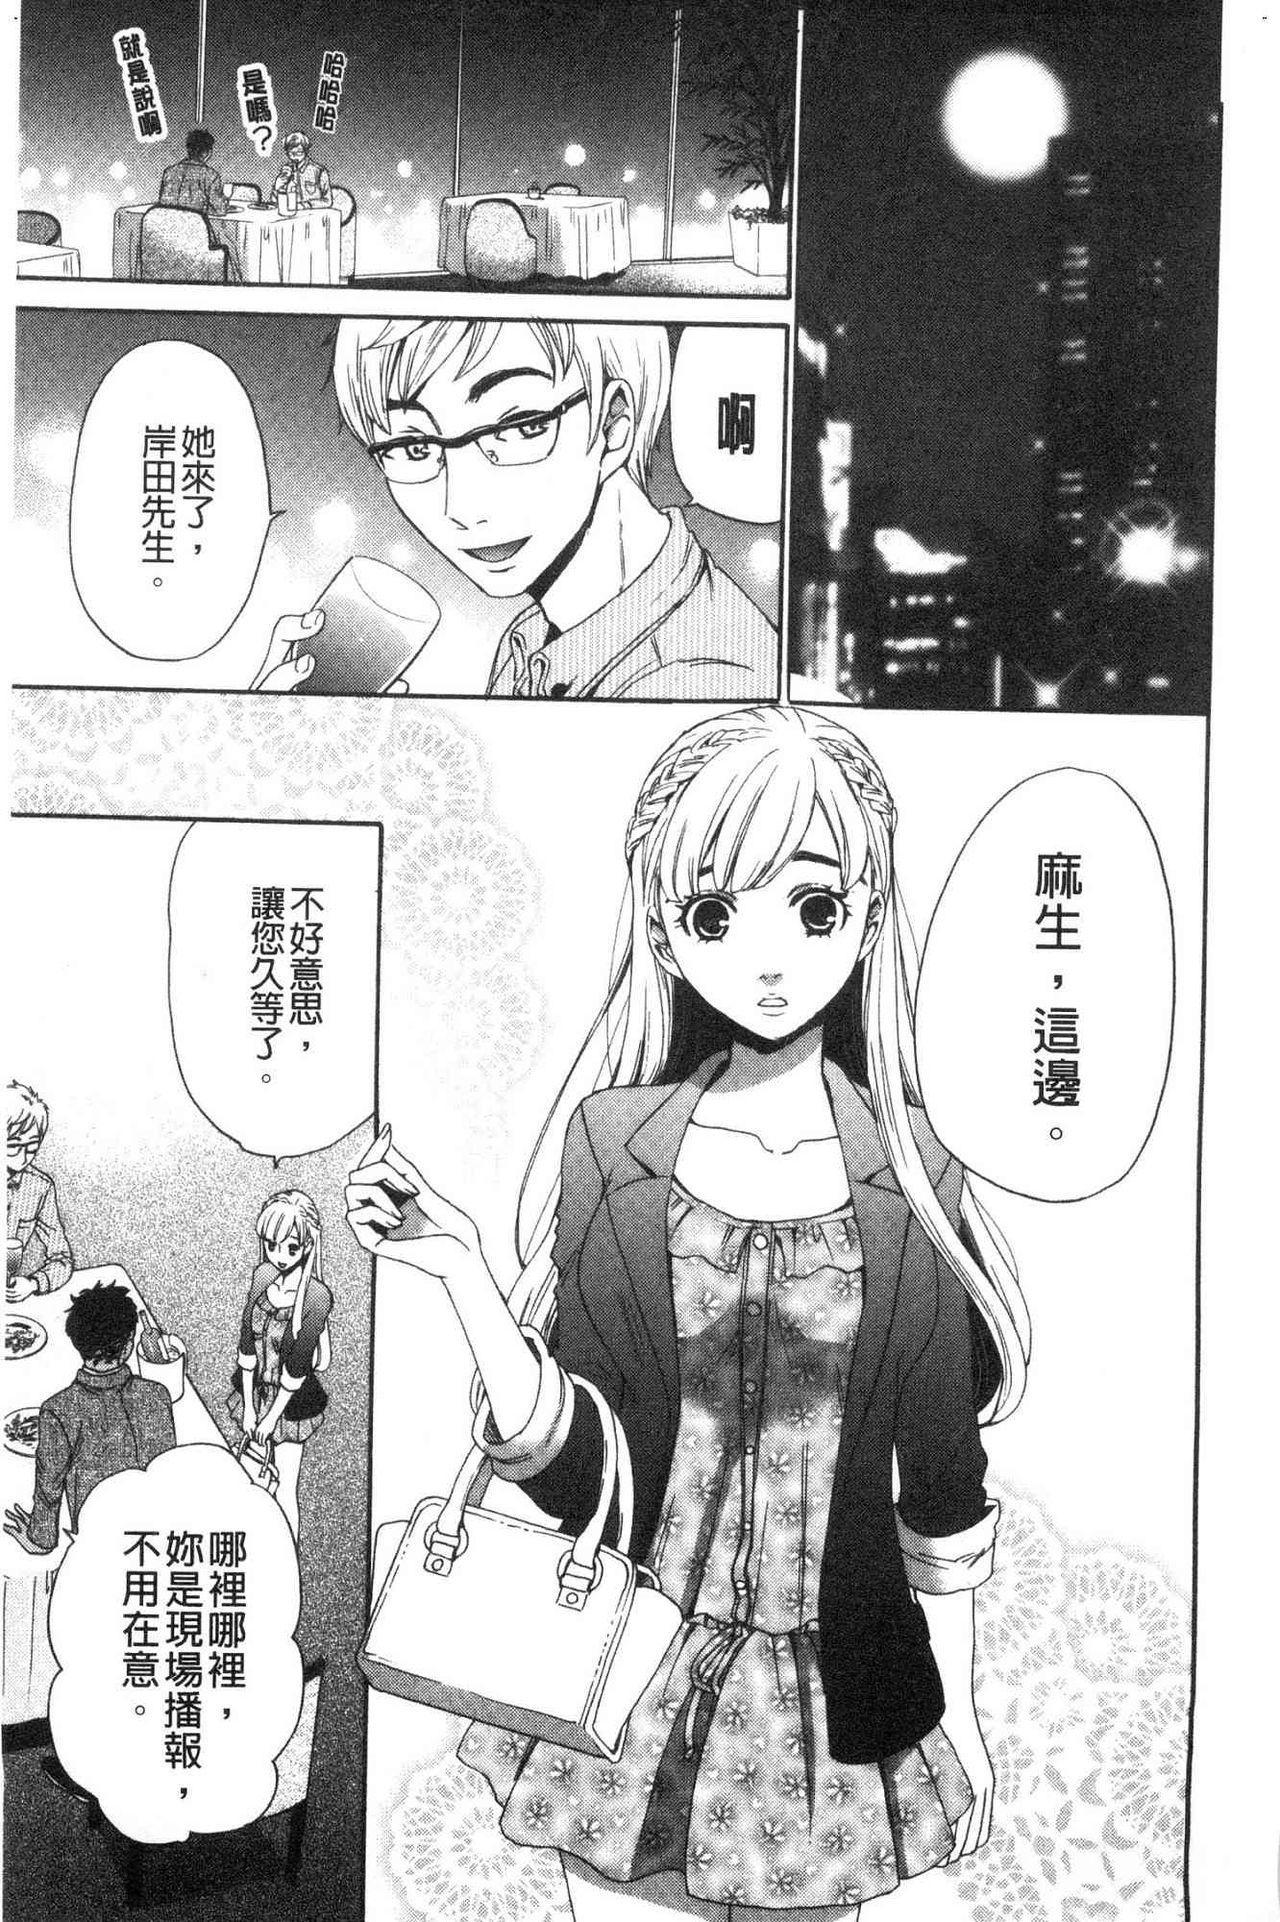 [Gotoh Akira]  21-ji no Onna ~Camera no Mae no Mesuinu~ 2 | 21時之女 ~鏡頭前的牝犬~ 2 [Chinese] 6